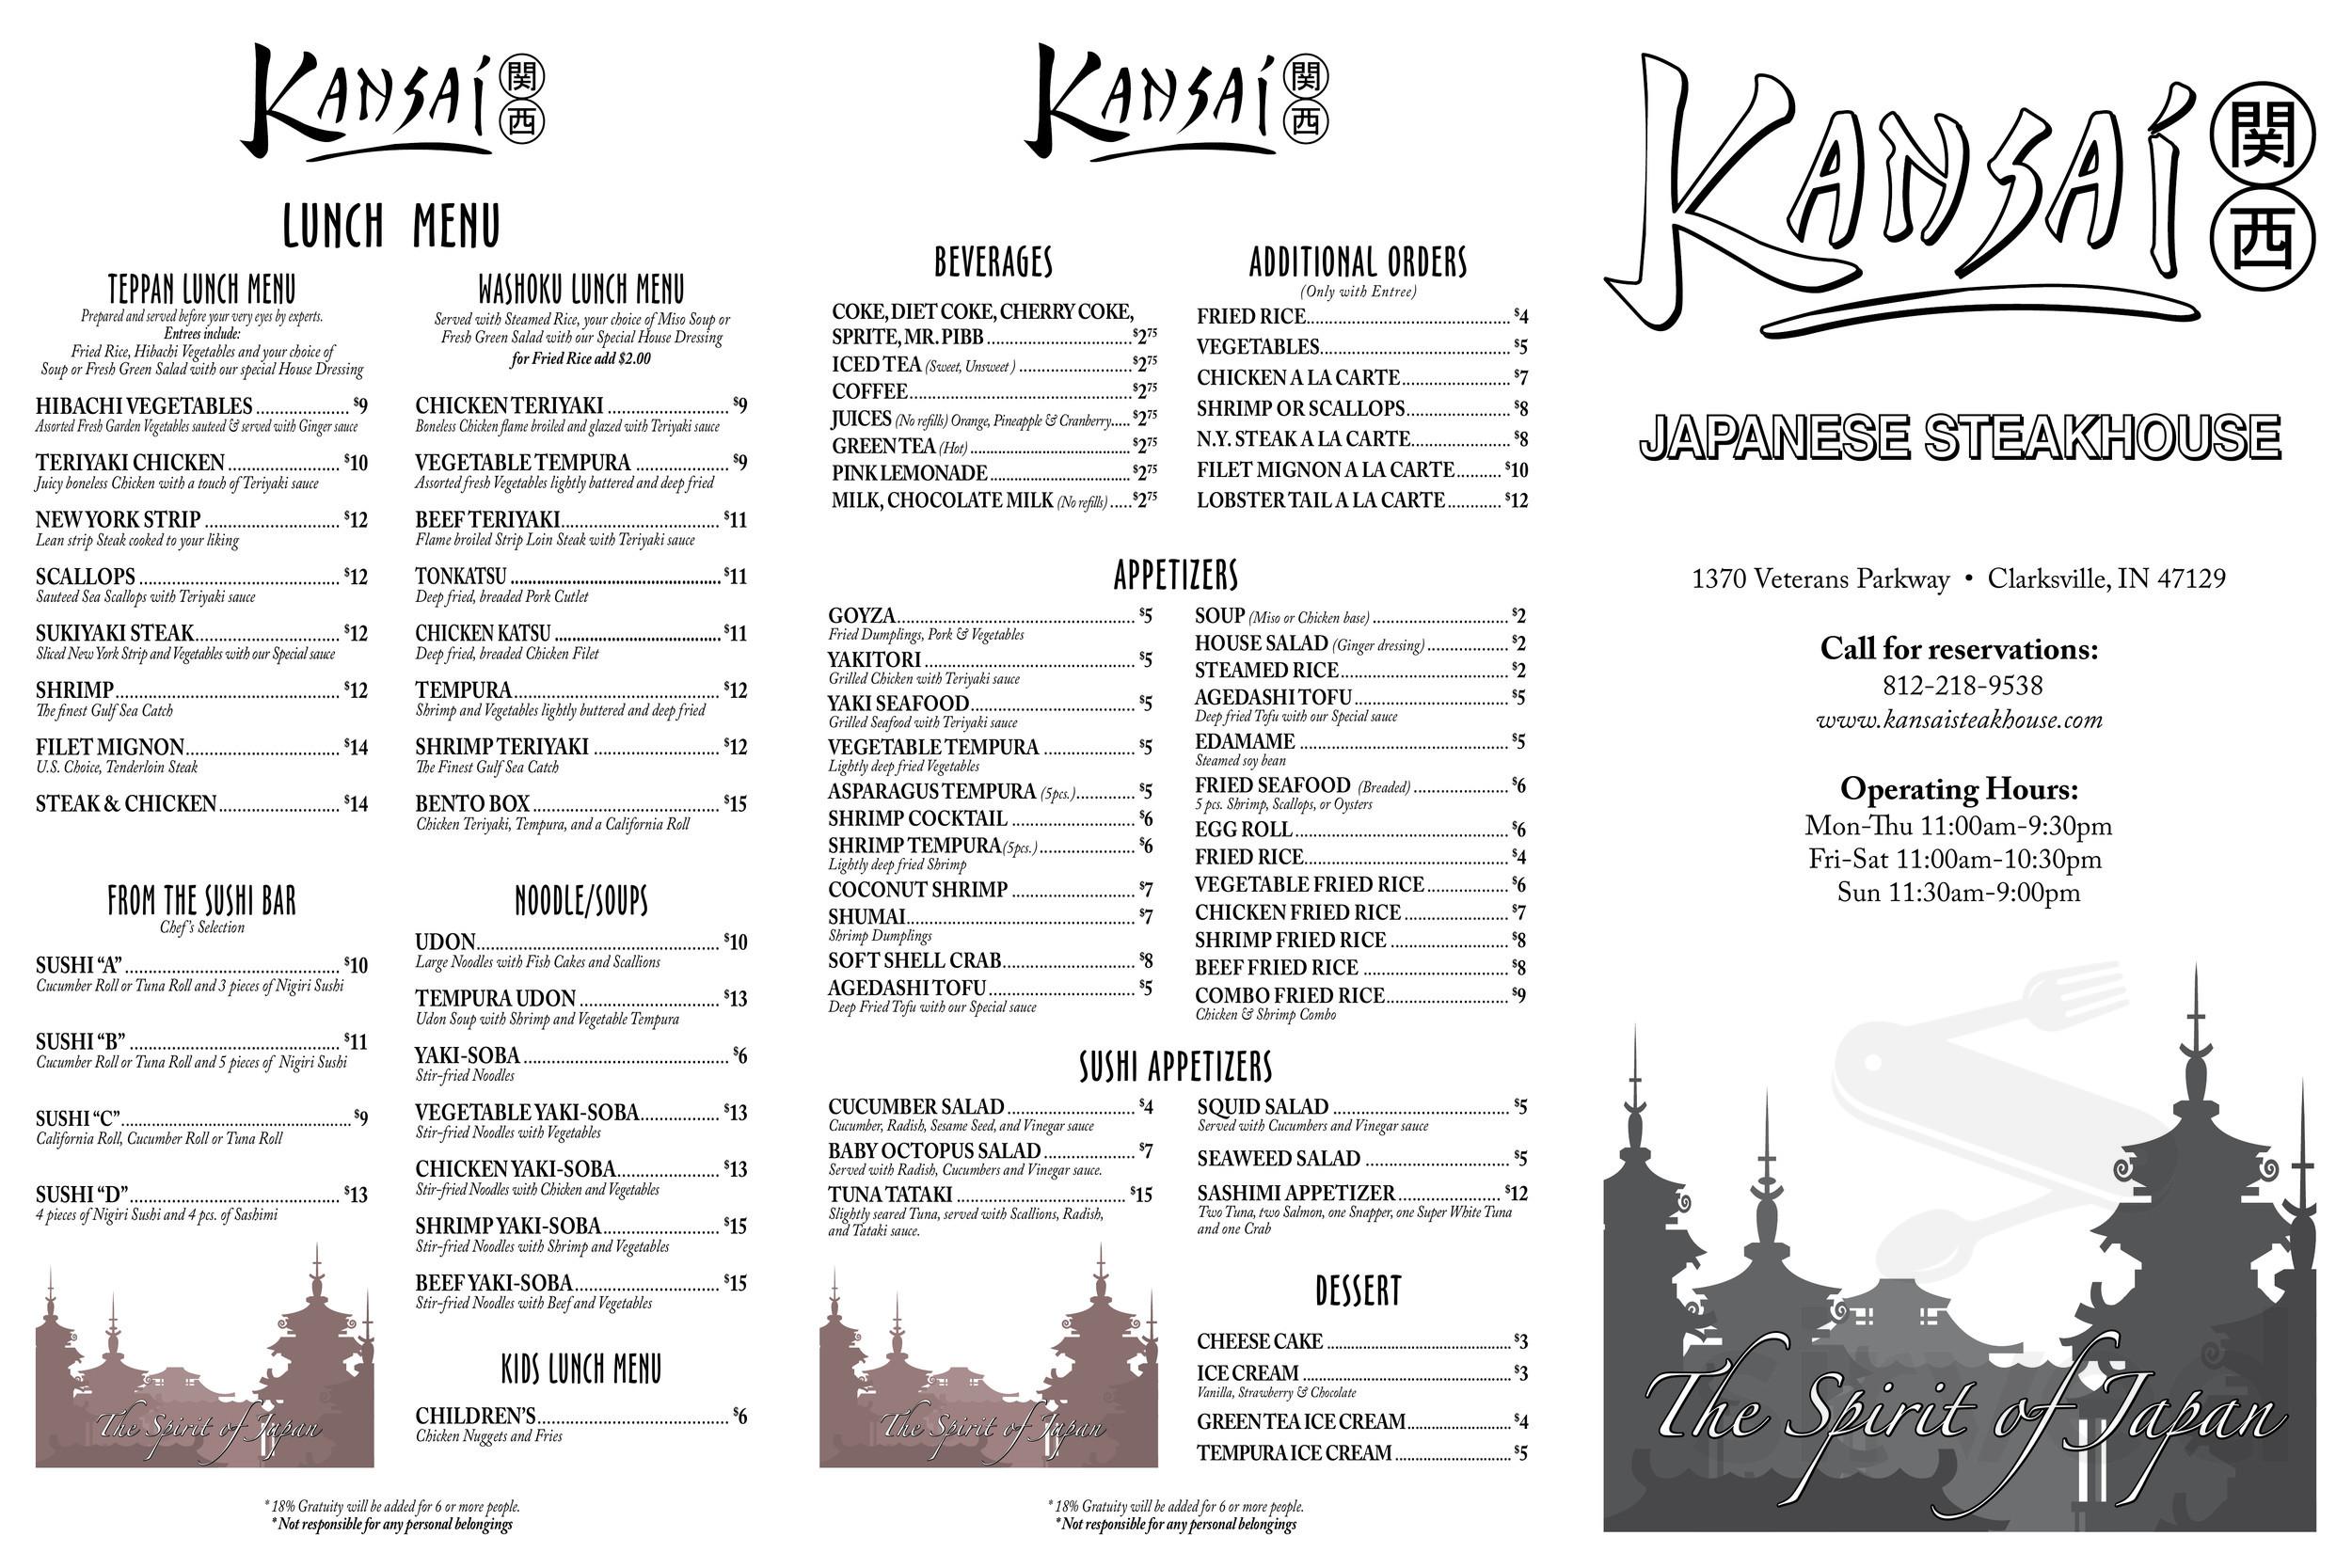 Menu For Kansai Japanese Steakhouse In Louisville Kentucky